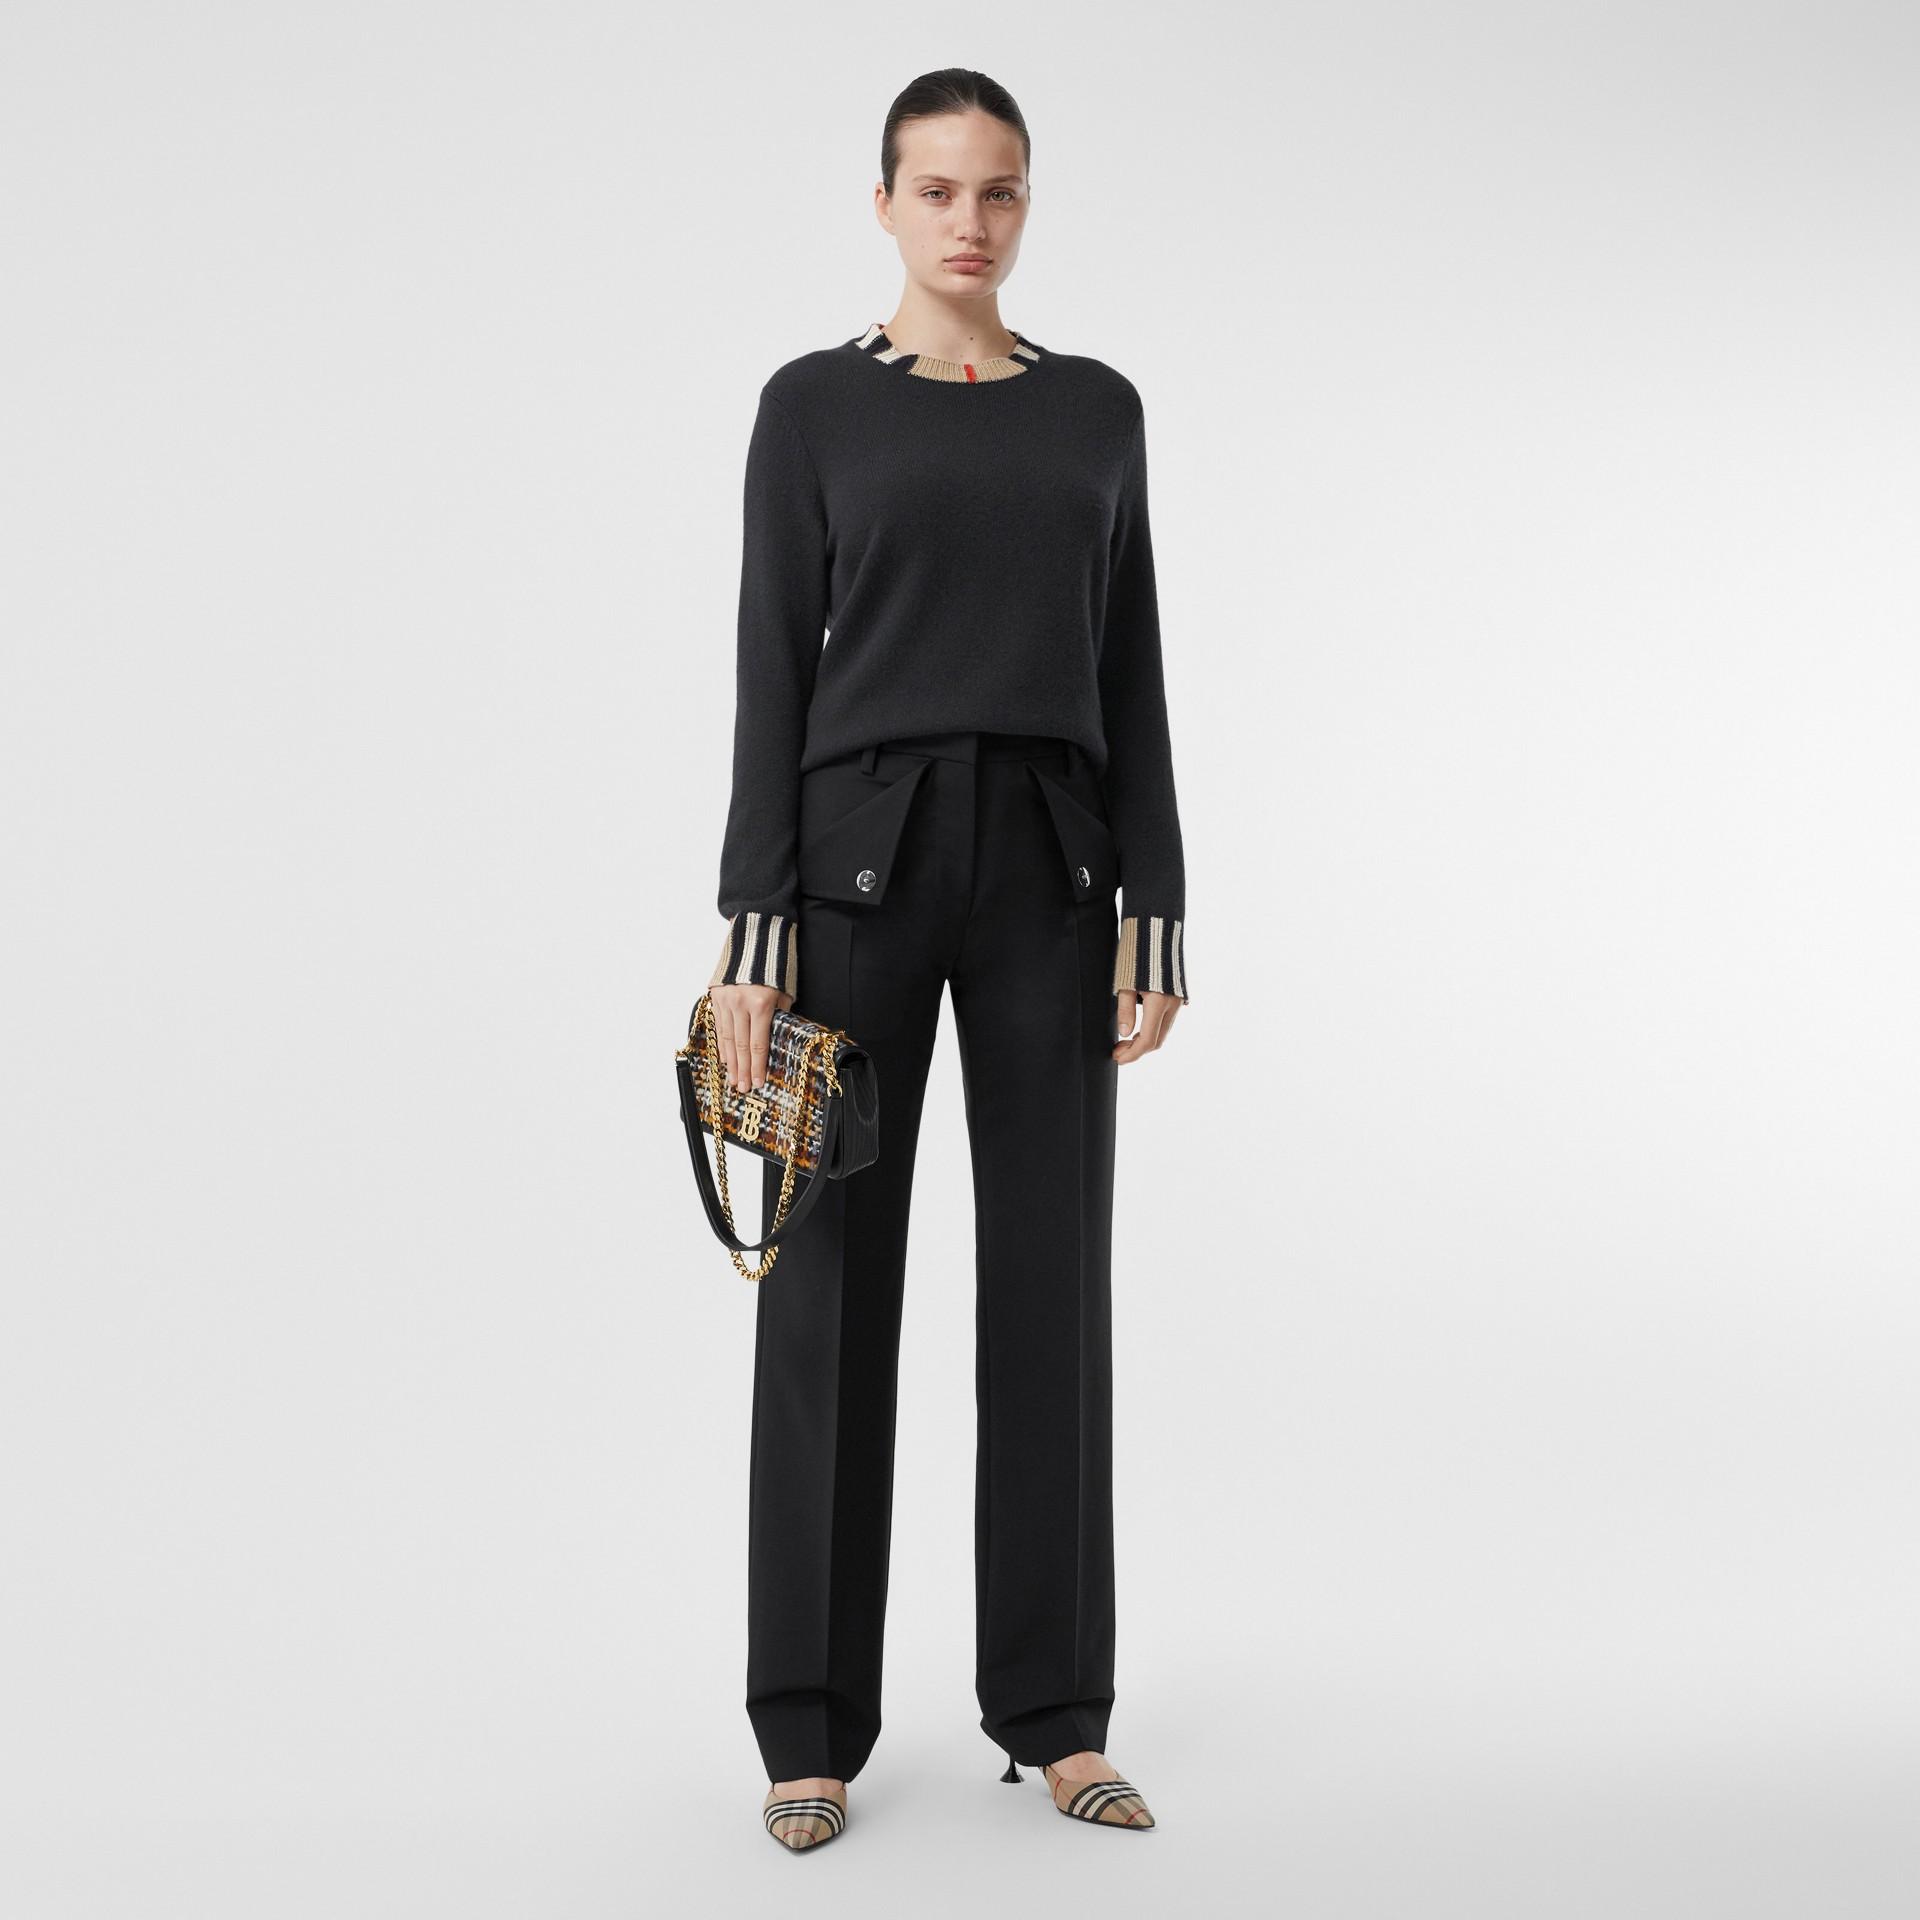 Icon Stripe Trim Cashmere Sweater in Black - Women | Burberry - gallery image 5